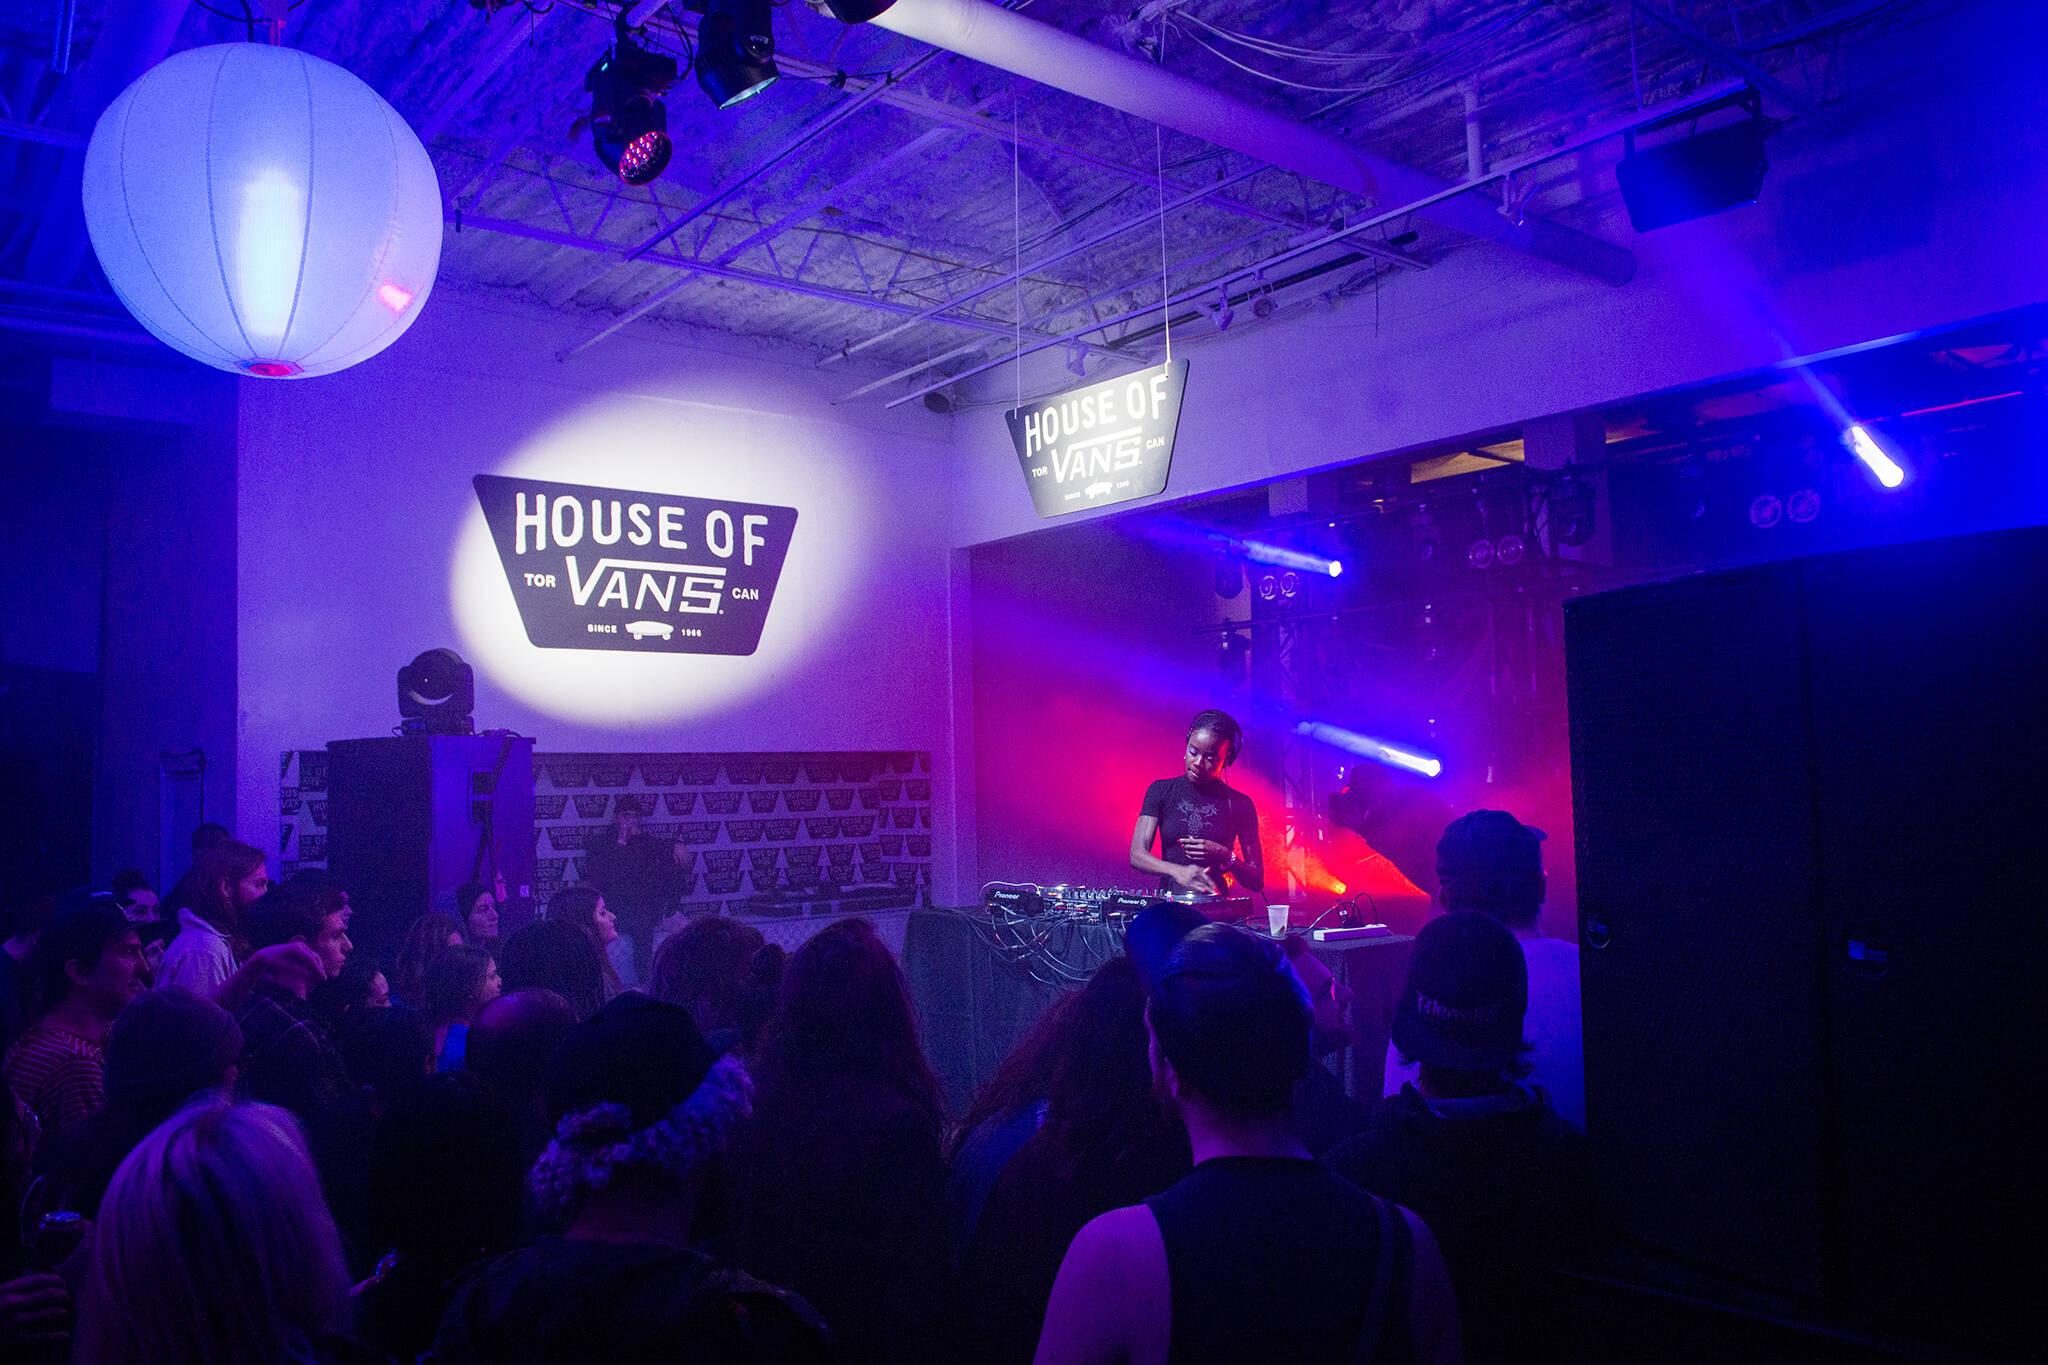 House of Vans Toronto